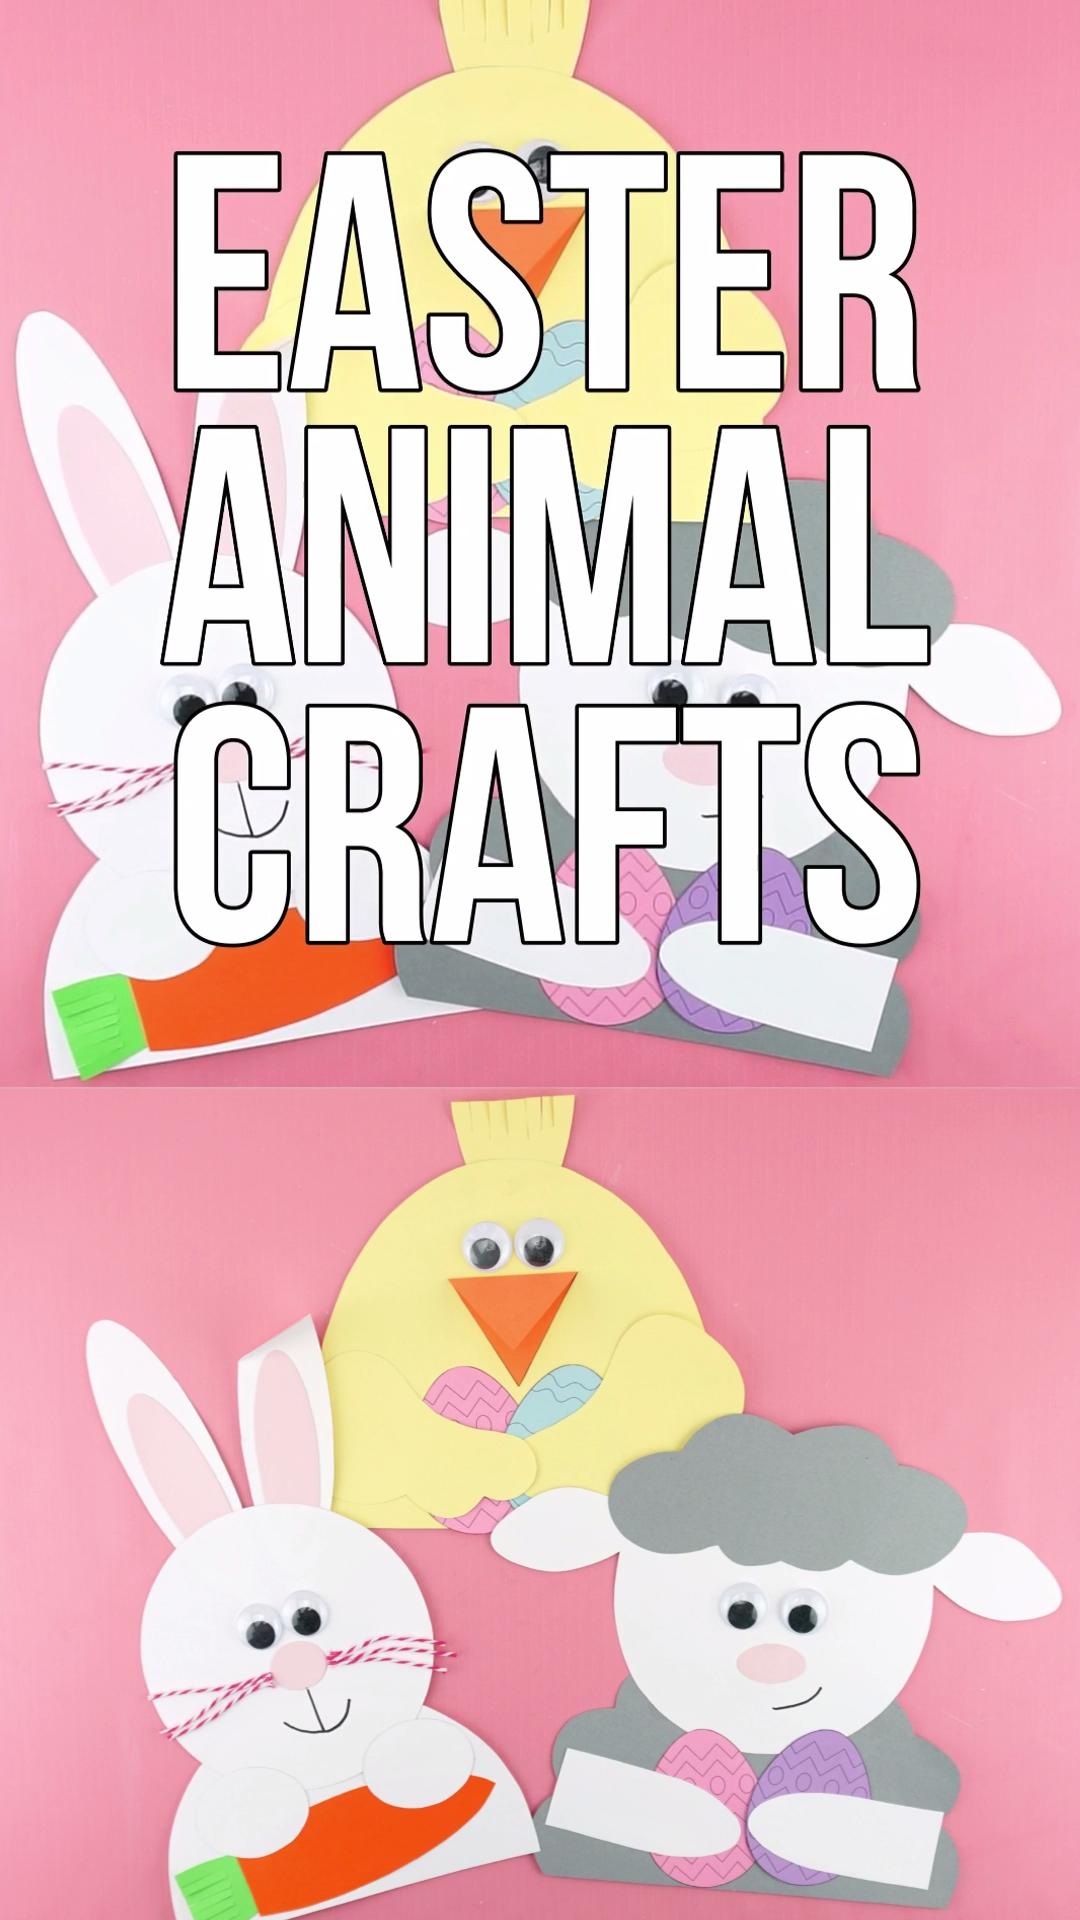 Easter Animal Crafts for Kids